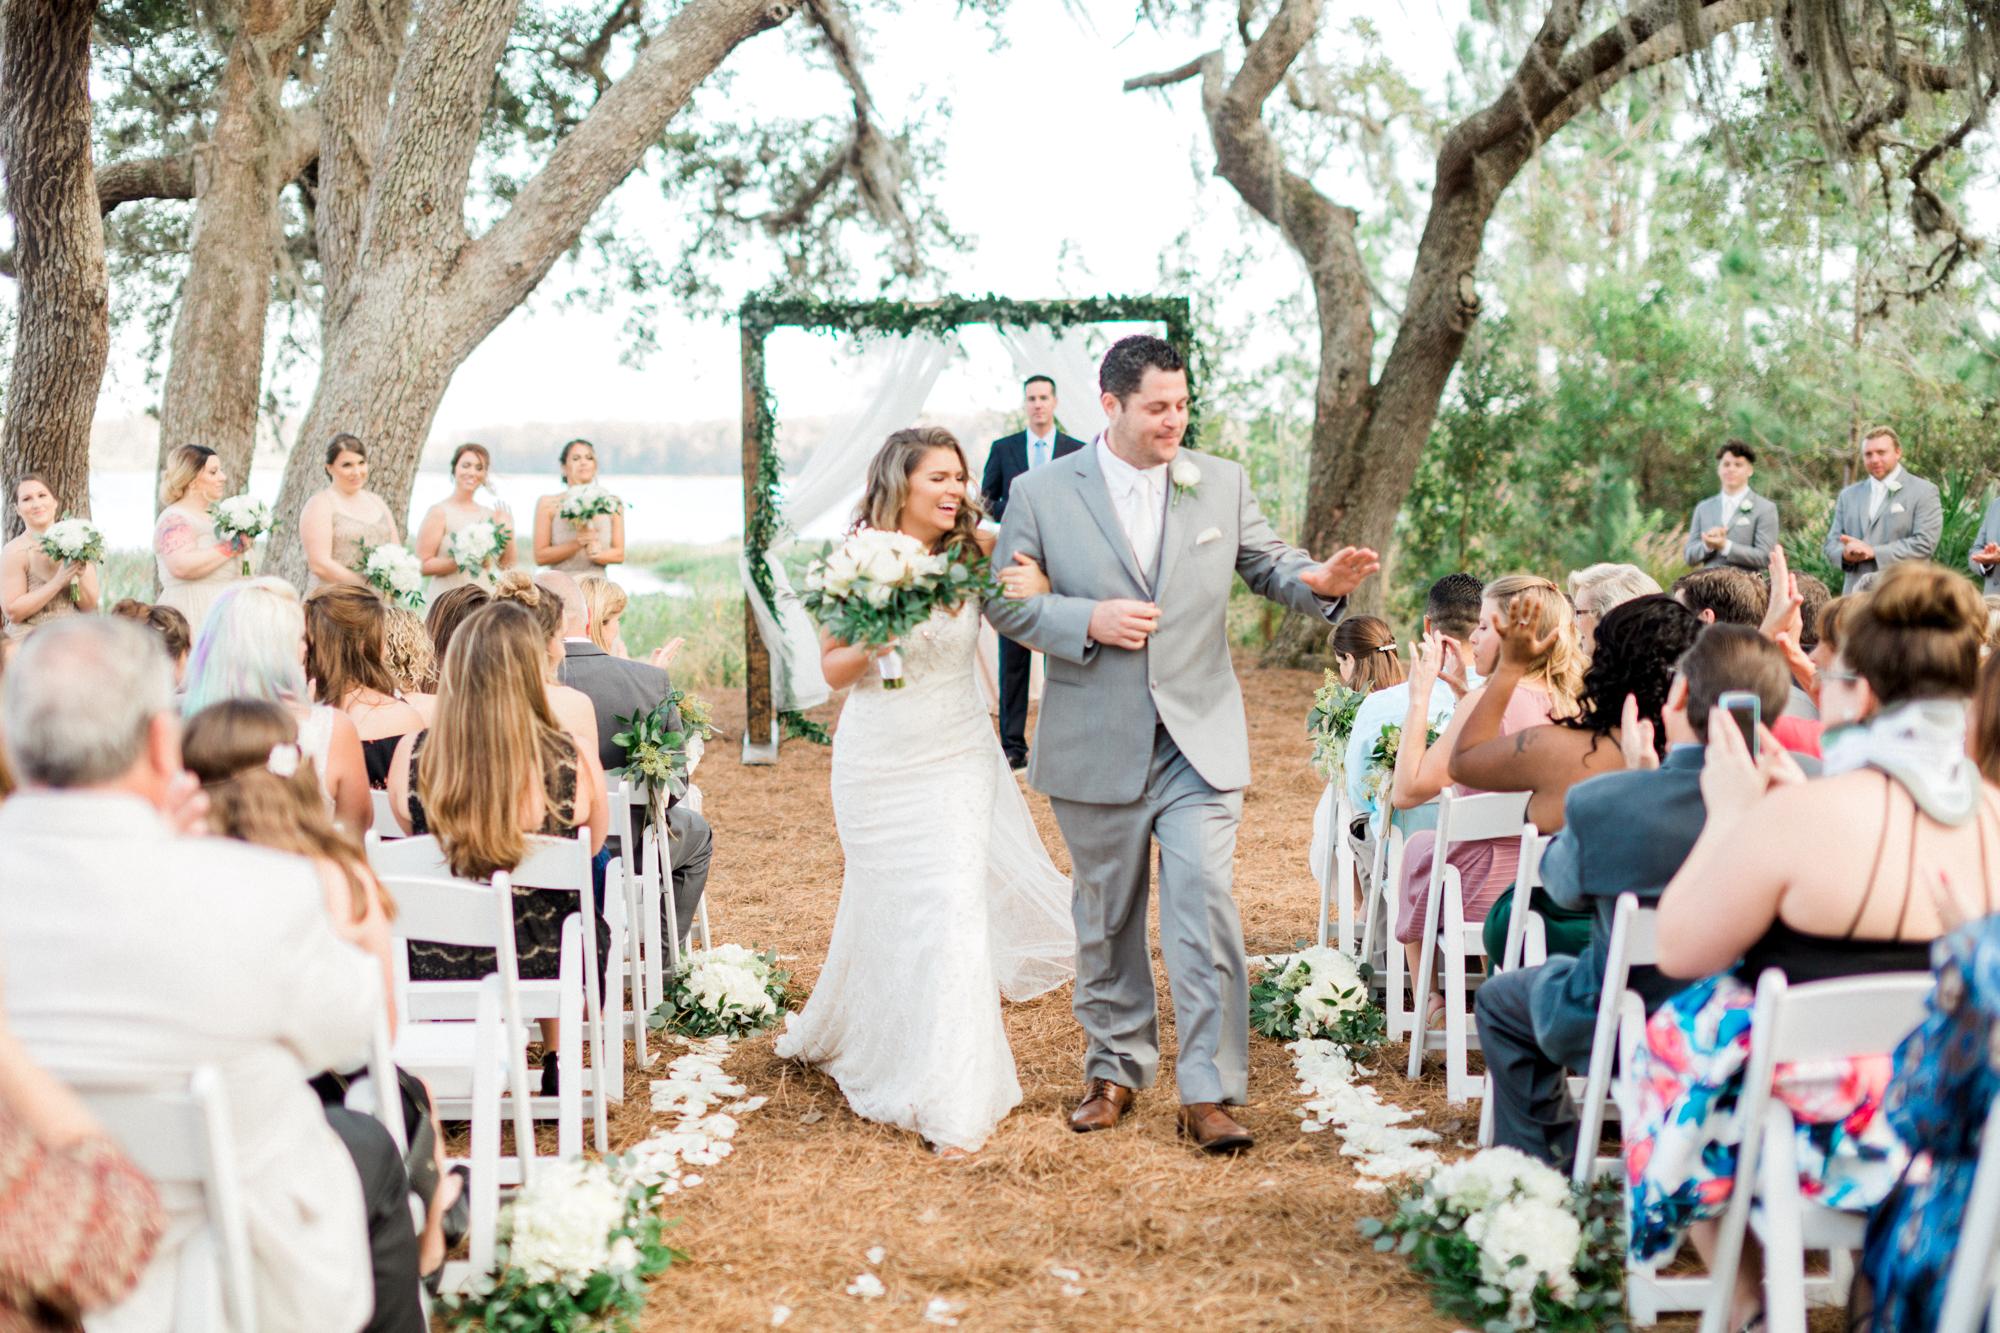 jessica-bellinger-photography-harmony-golf-preserve-wedding-photos-9183.jpg